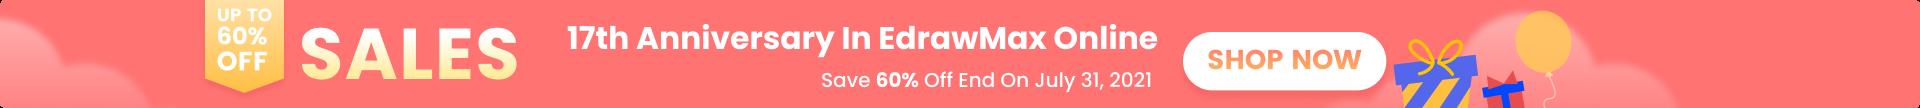 EdrawMax promotion